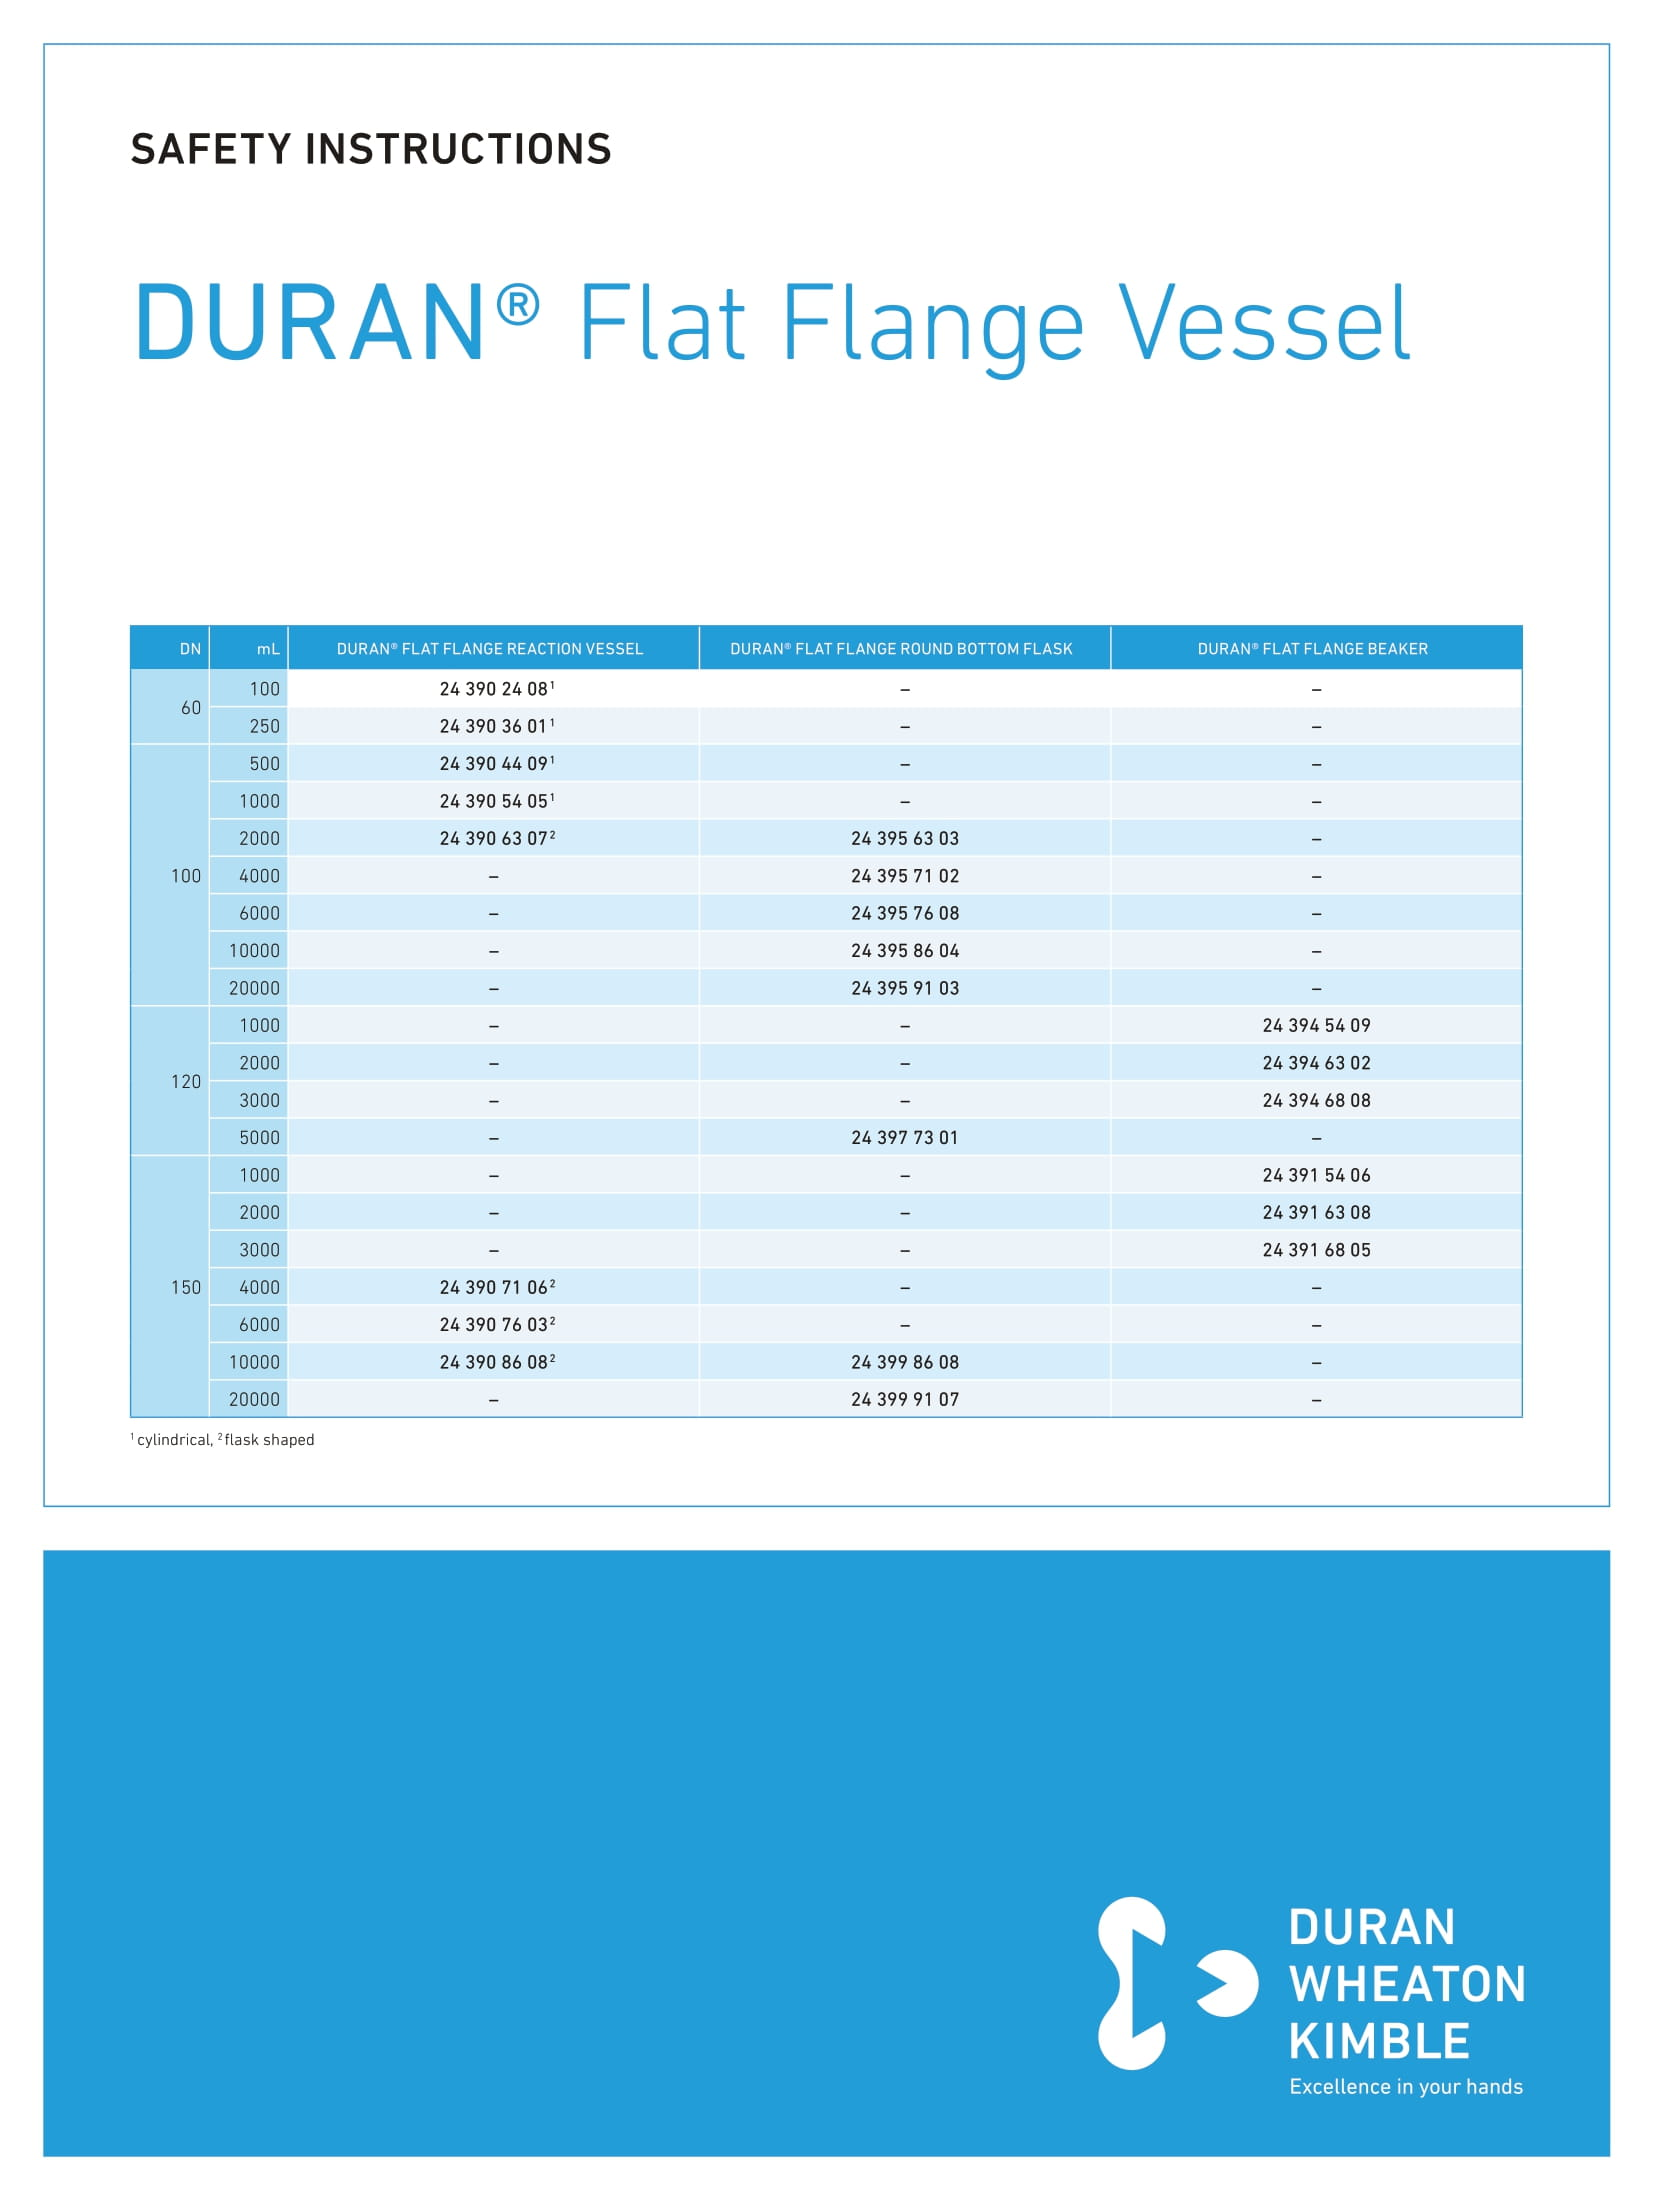 DWK SAFETY INSTRUCTIONS DURAN® Flat Flange Vessel